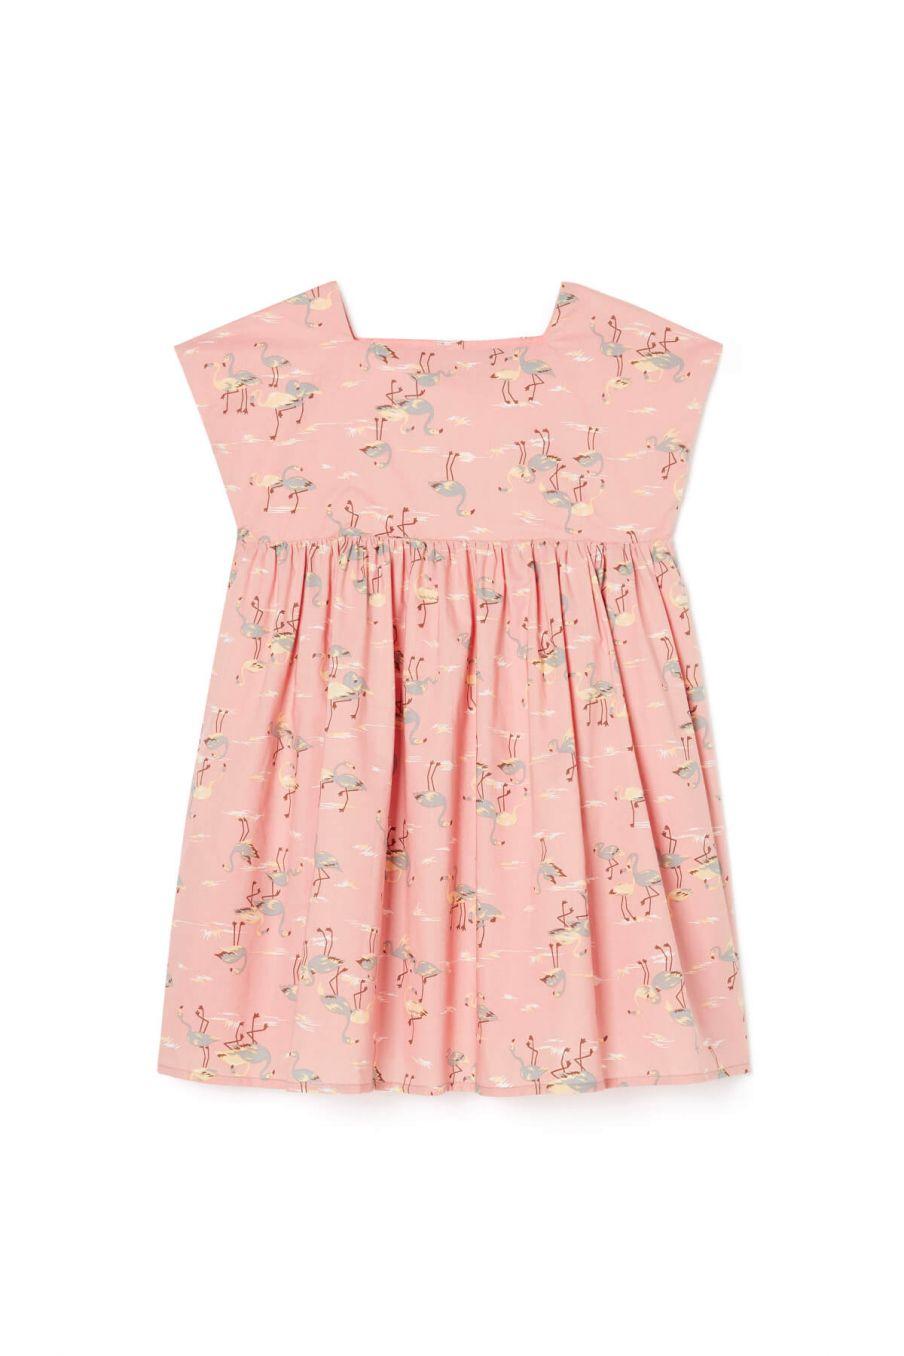 boheme chic vintage robe fille tapalpa flamingo